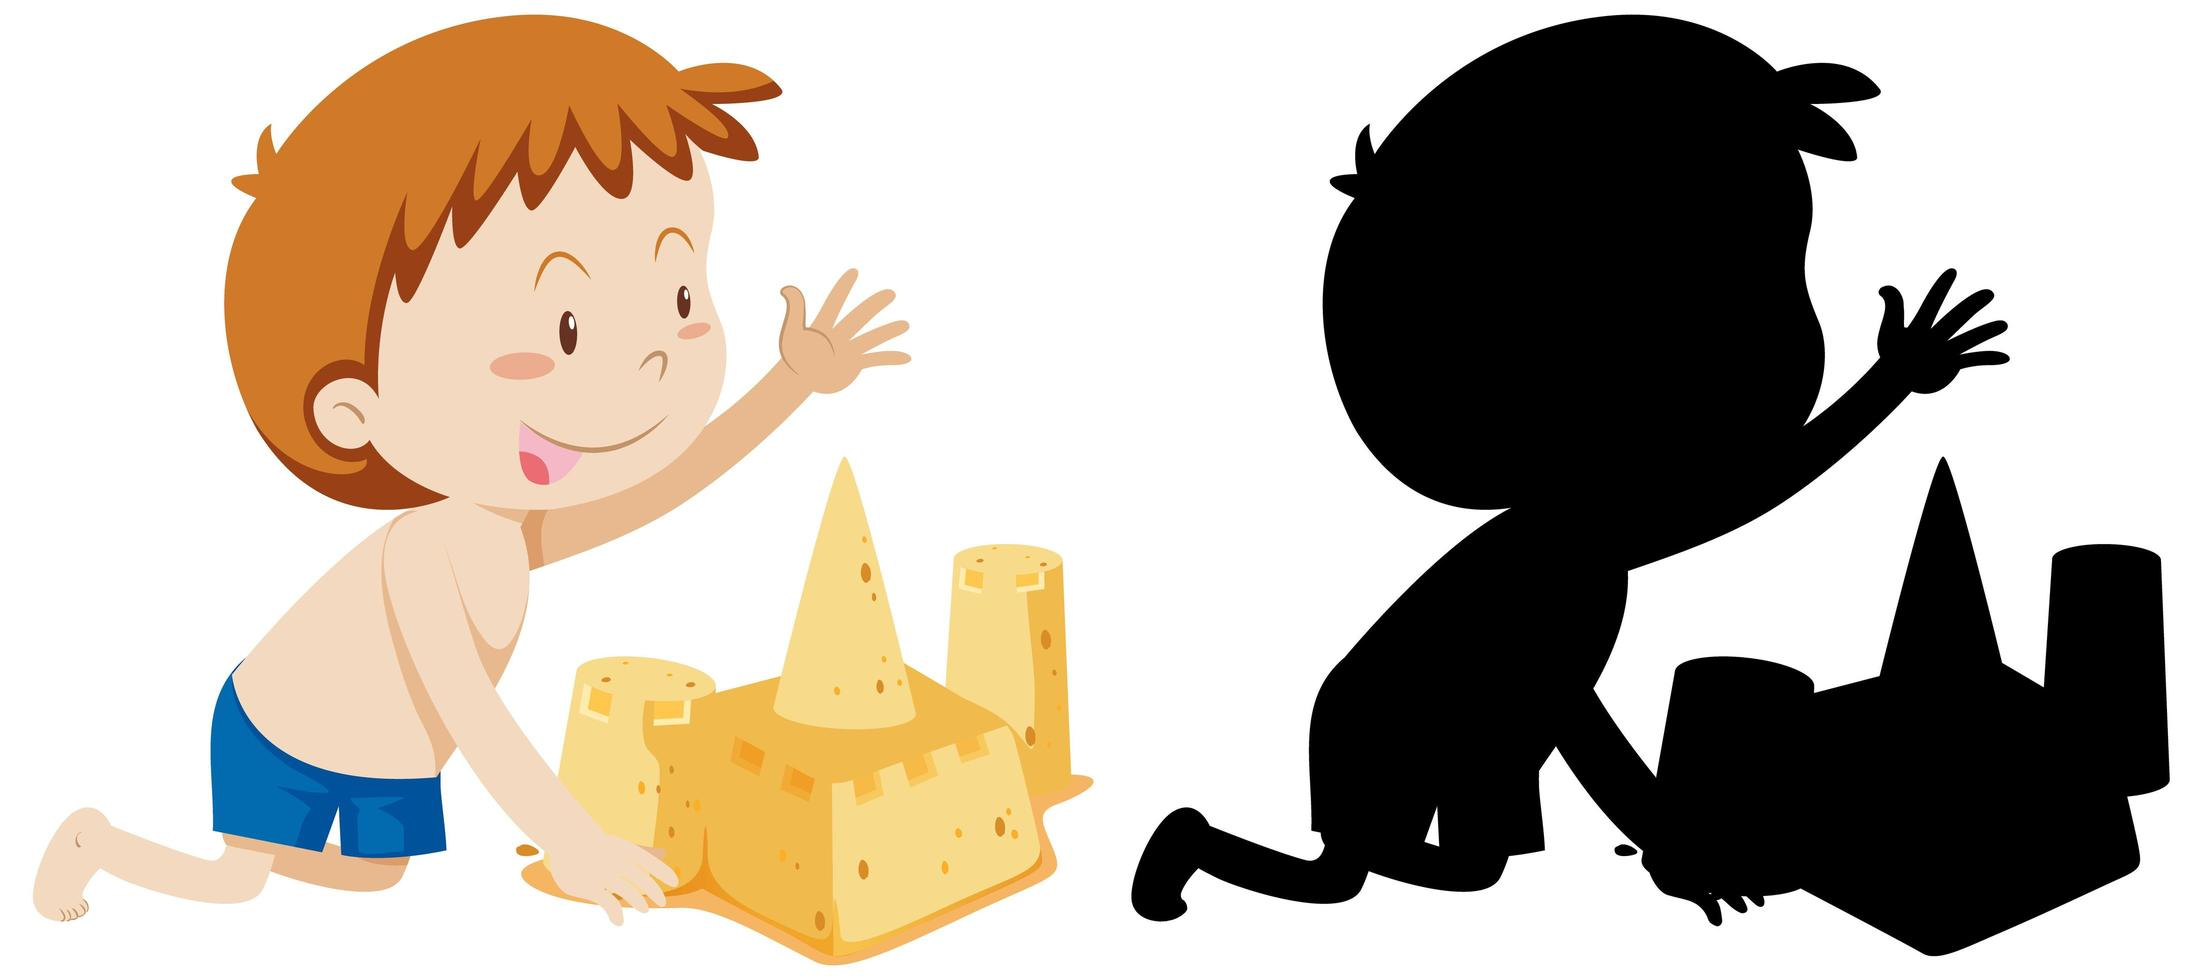 niño construyendo castillo de arena con silueta vector